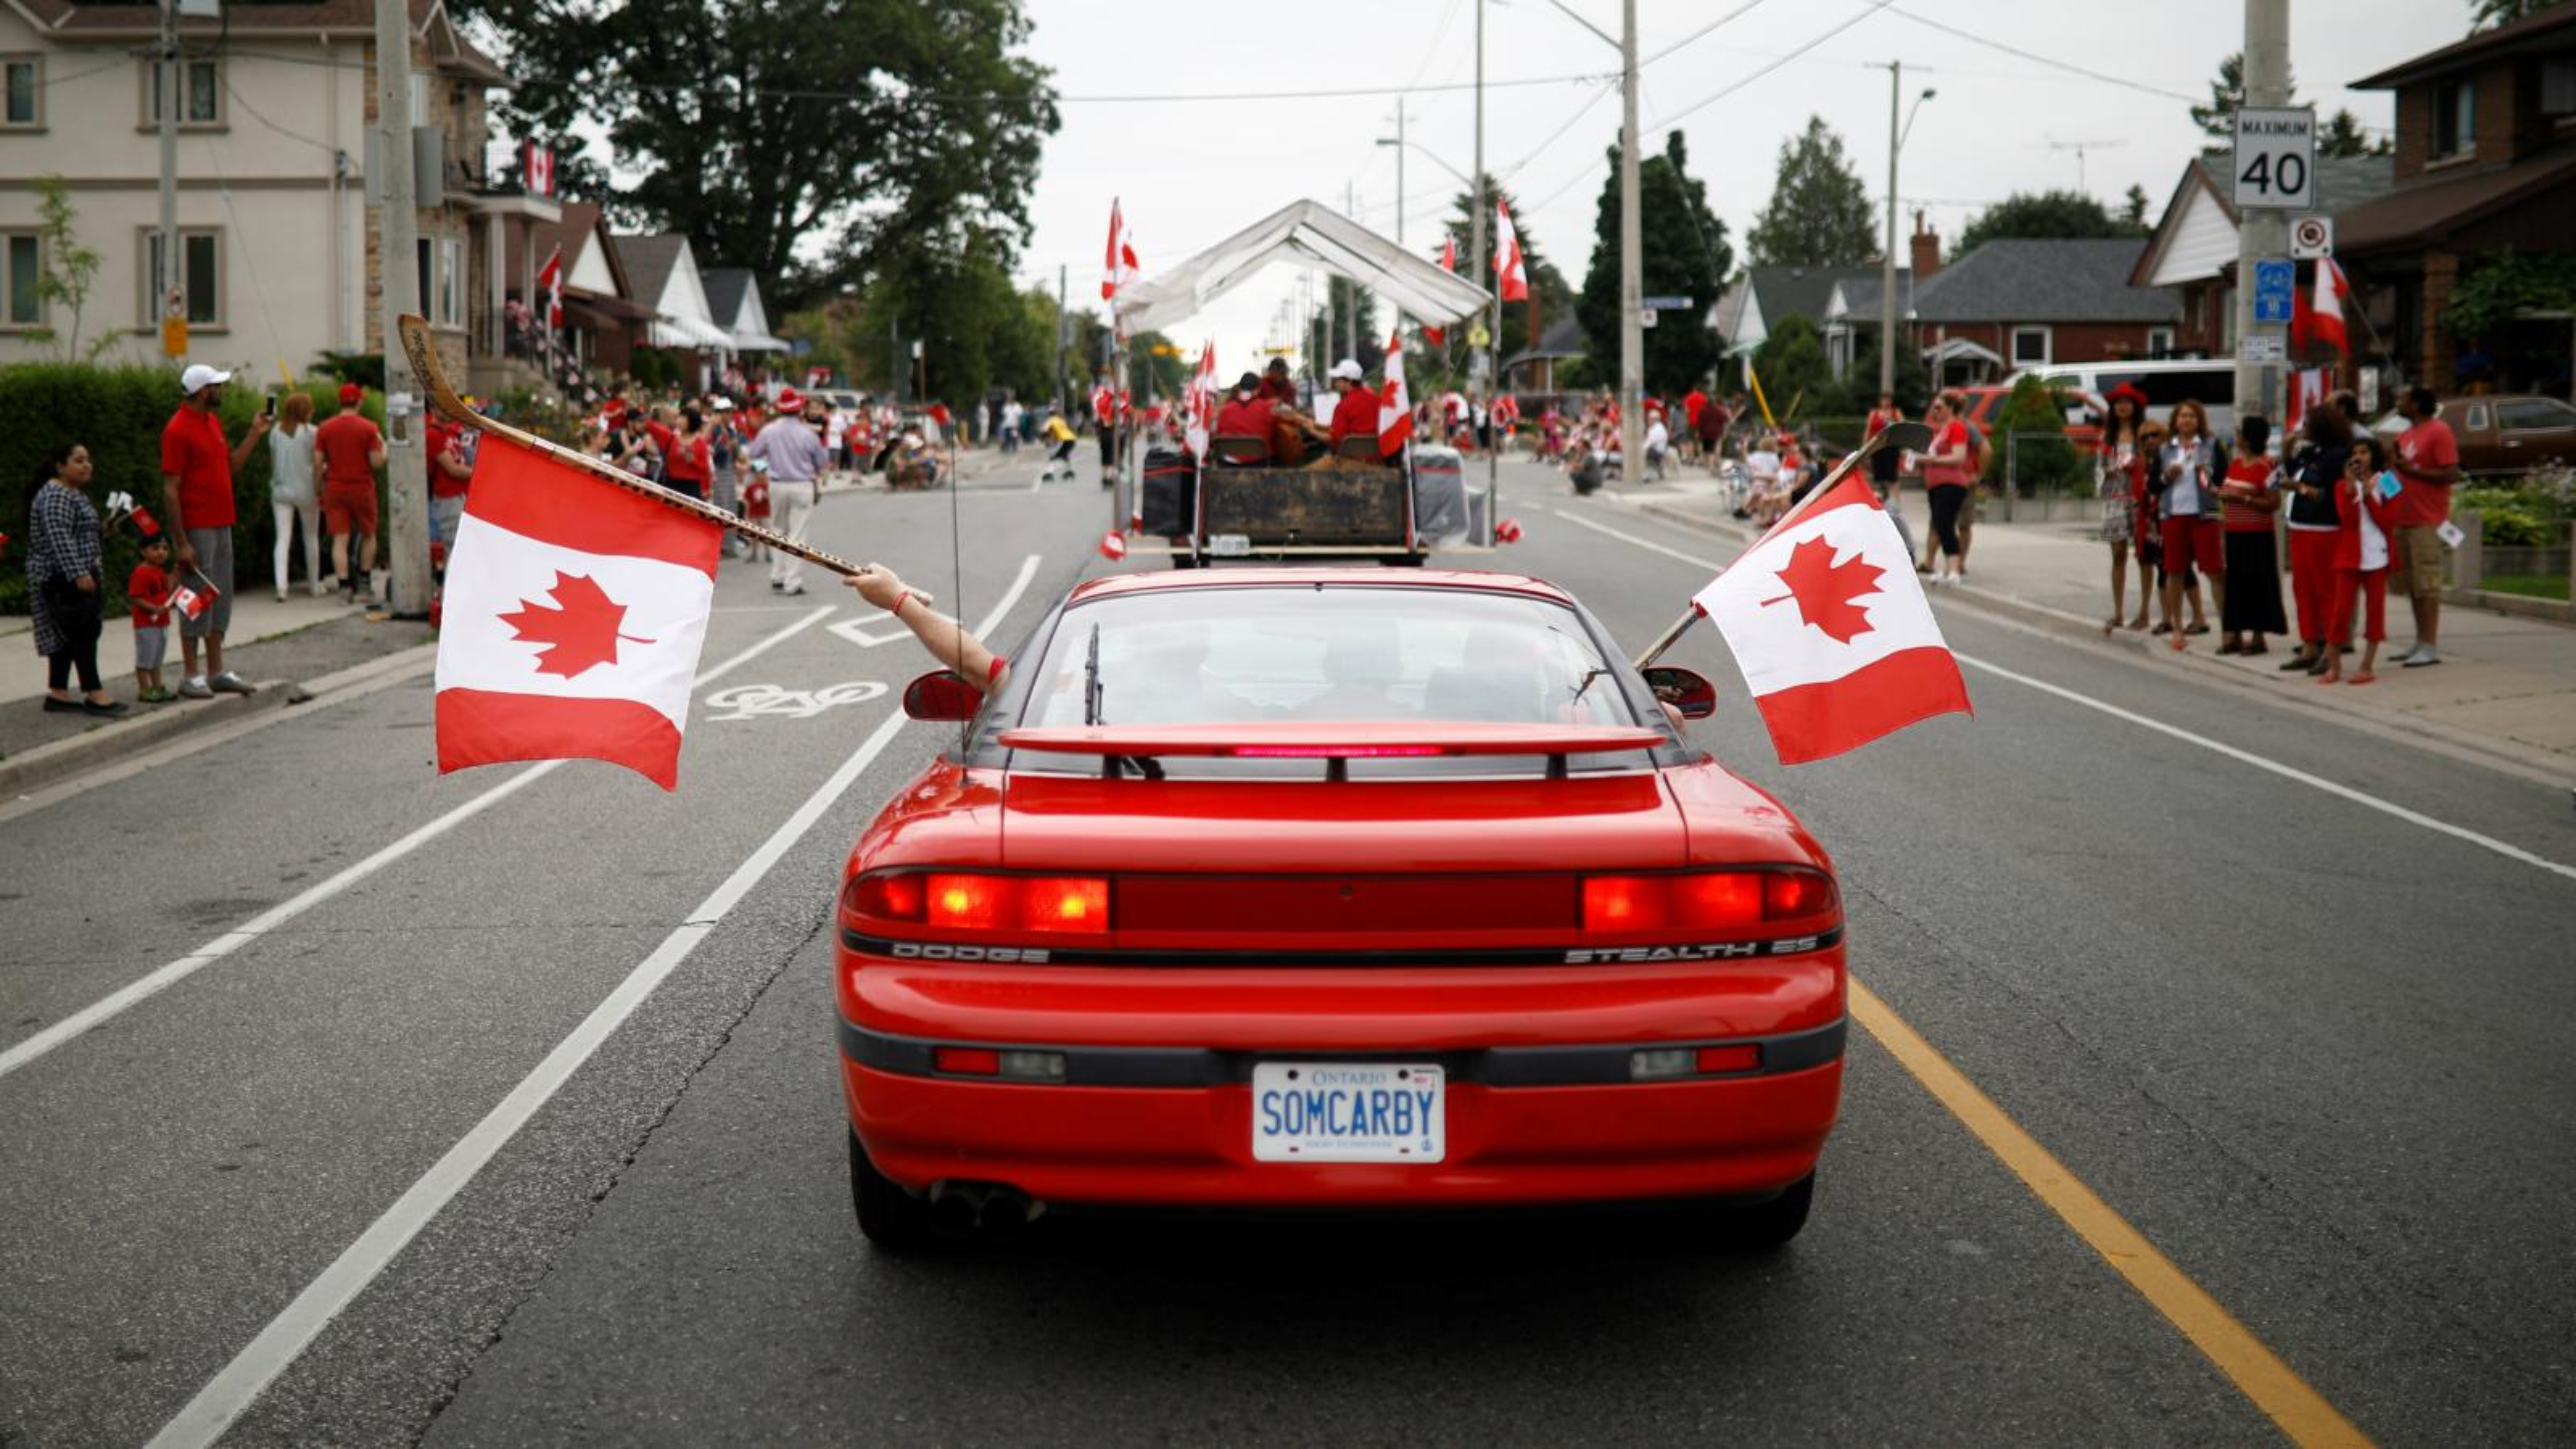 Nigeria Canada migration: Middle class professionals target